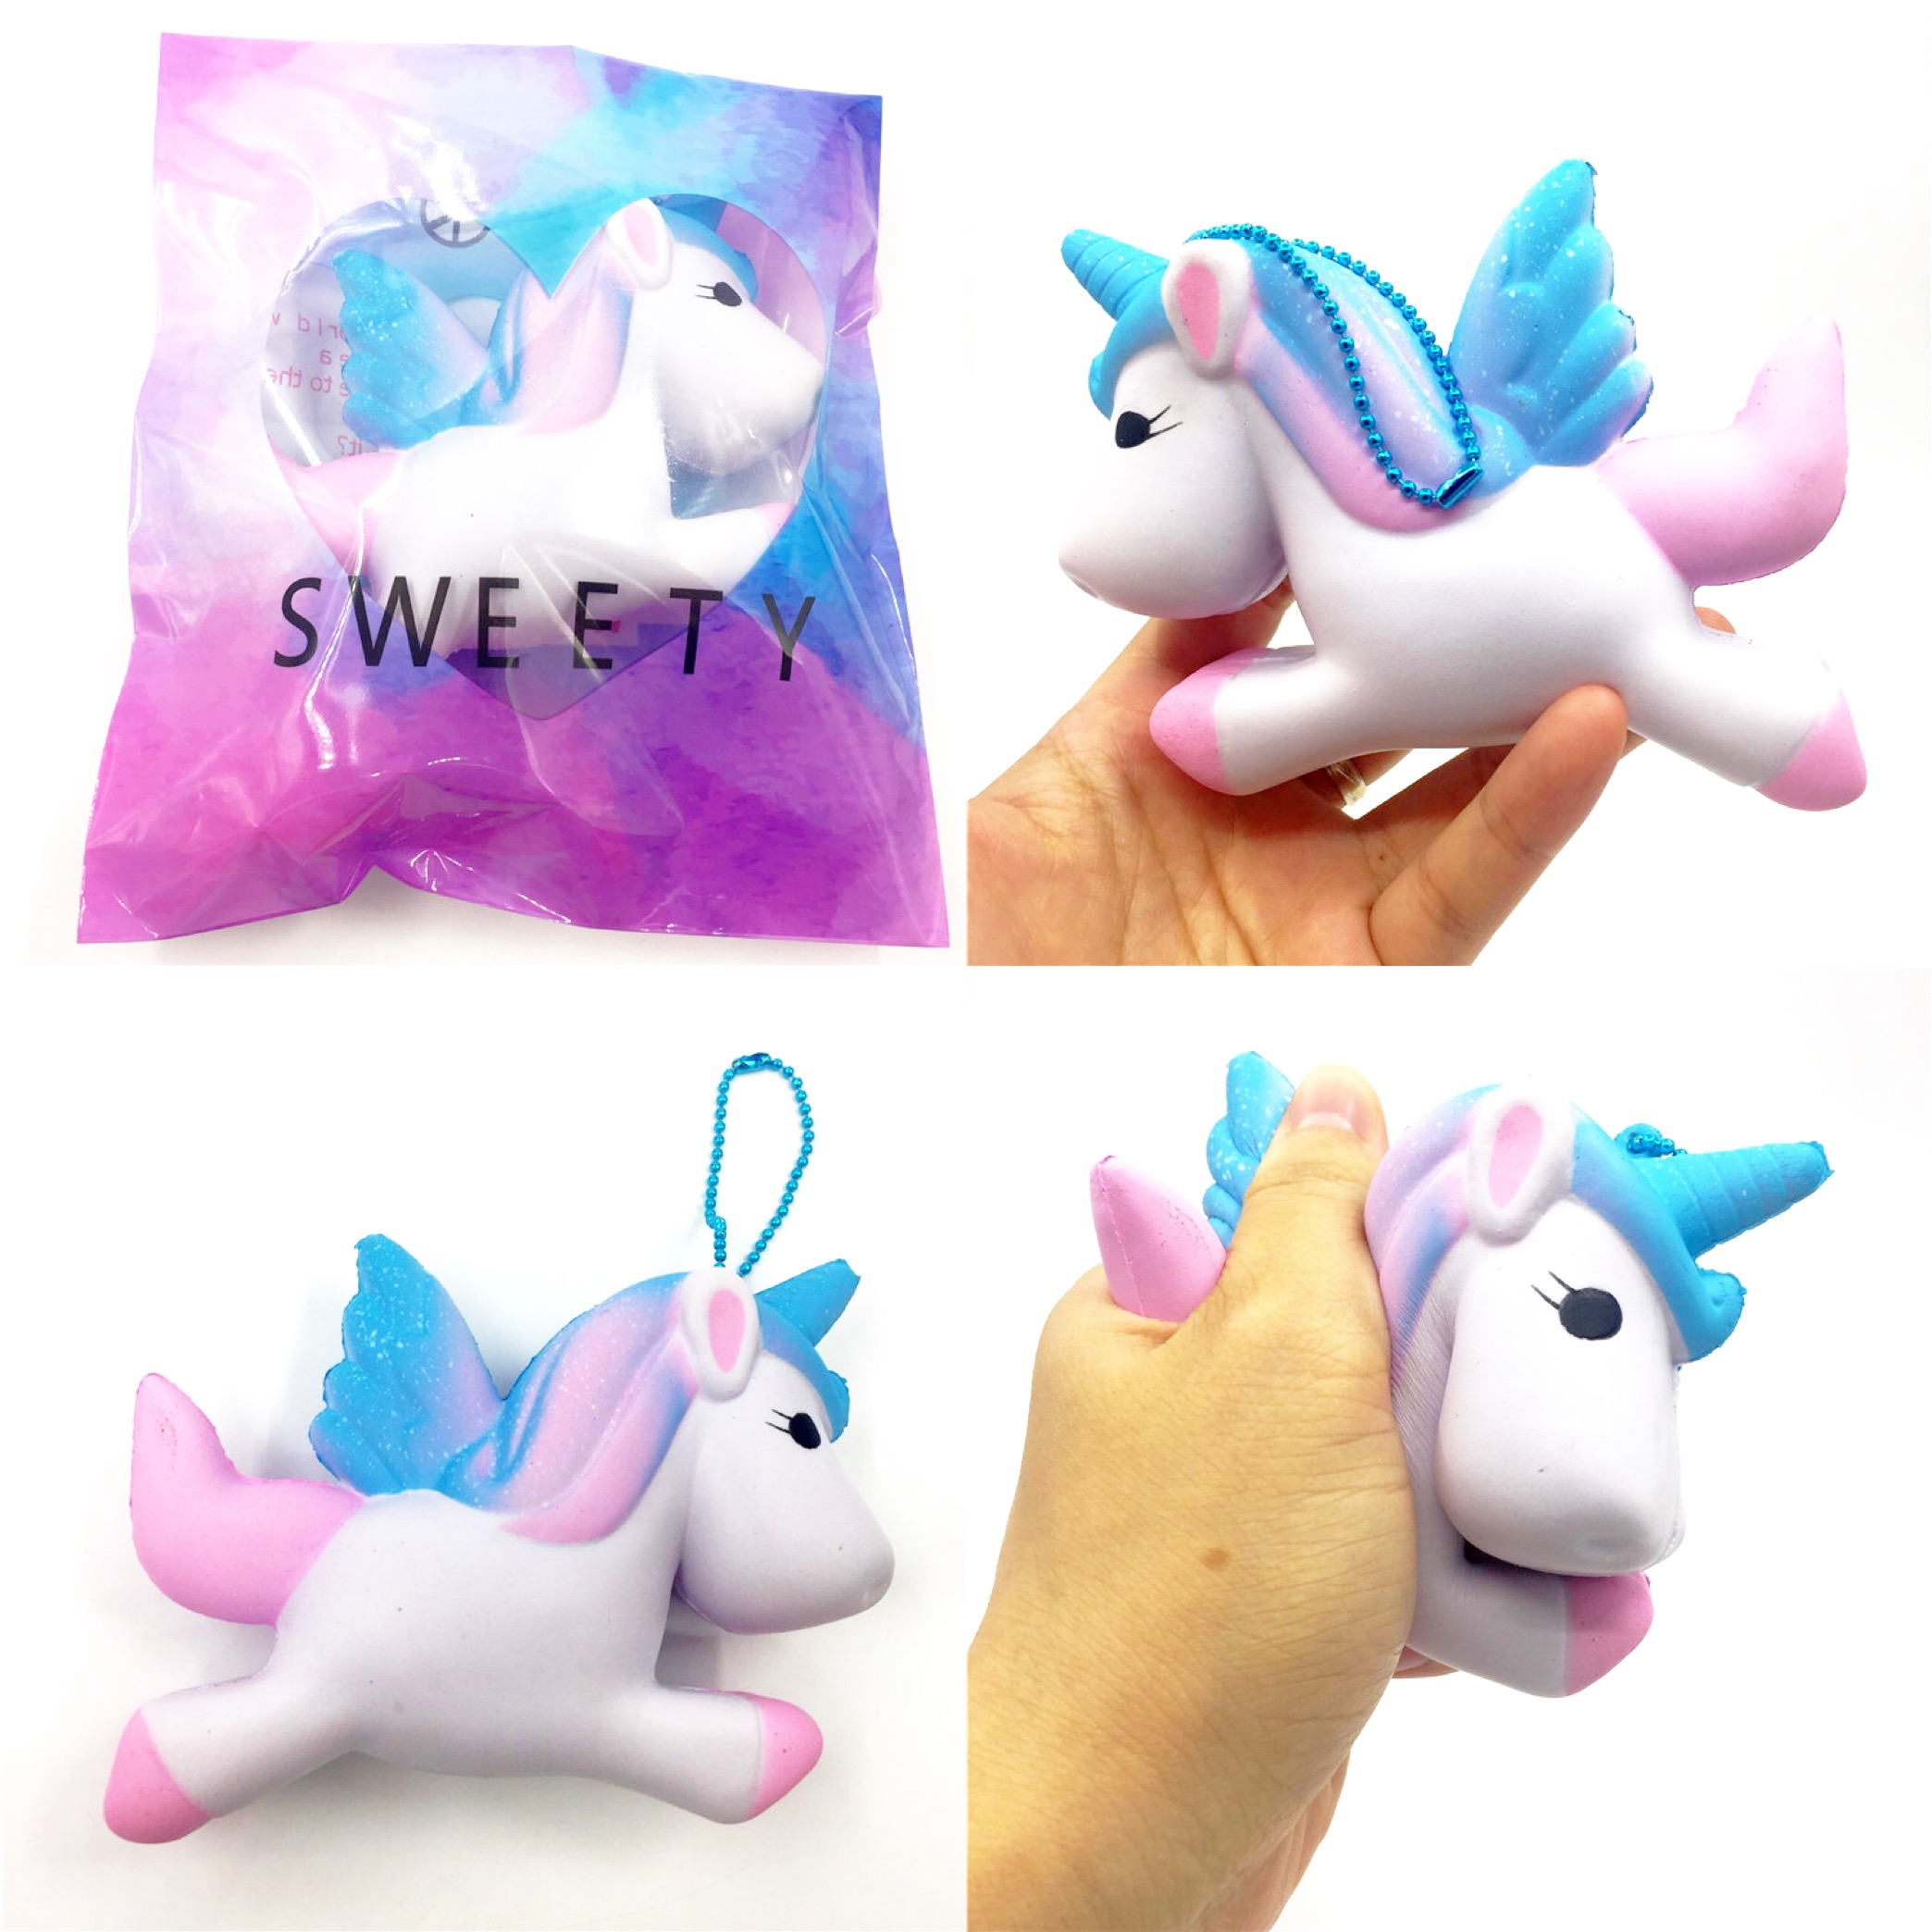 Squishy Jumbo Slow : Produs - Original Kawaii Unicorn Squishy Jumbo Slow Rising Cute Phone Straps Pendant Soft ...